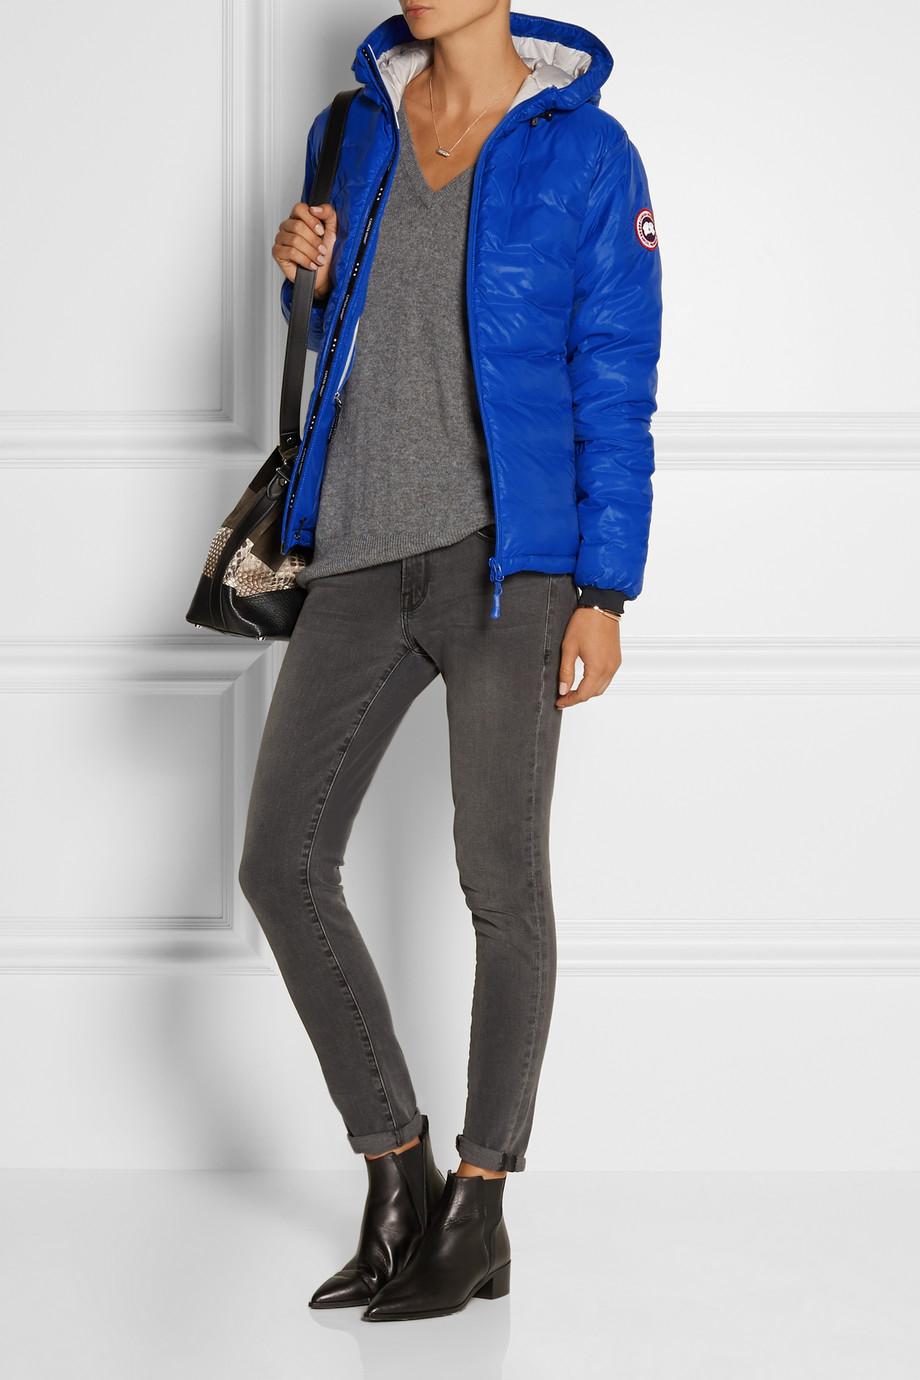 0226a909e hot canada goose camp hooded jacket blue womens vintage af73f 3a718